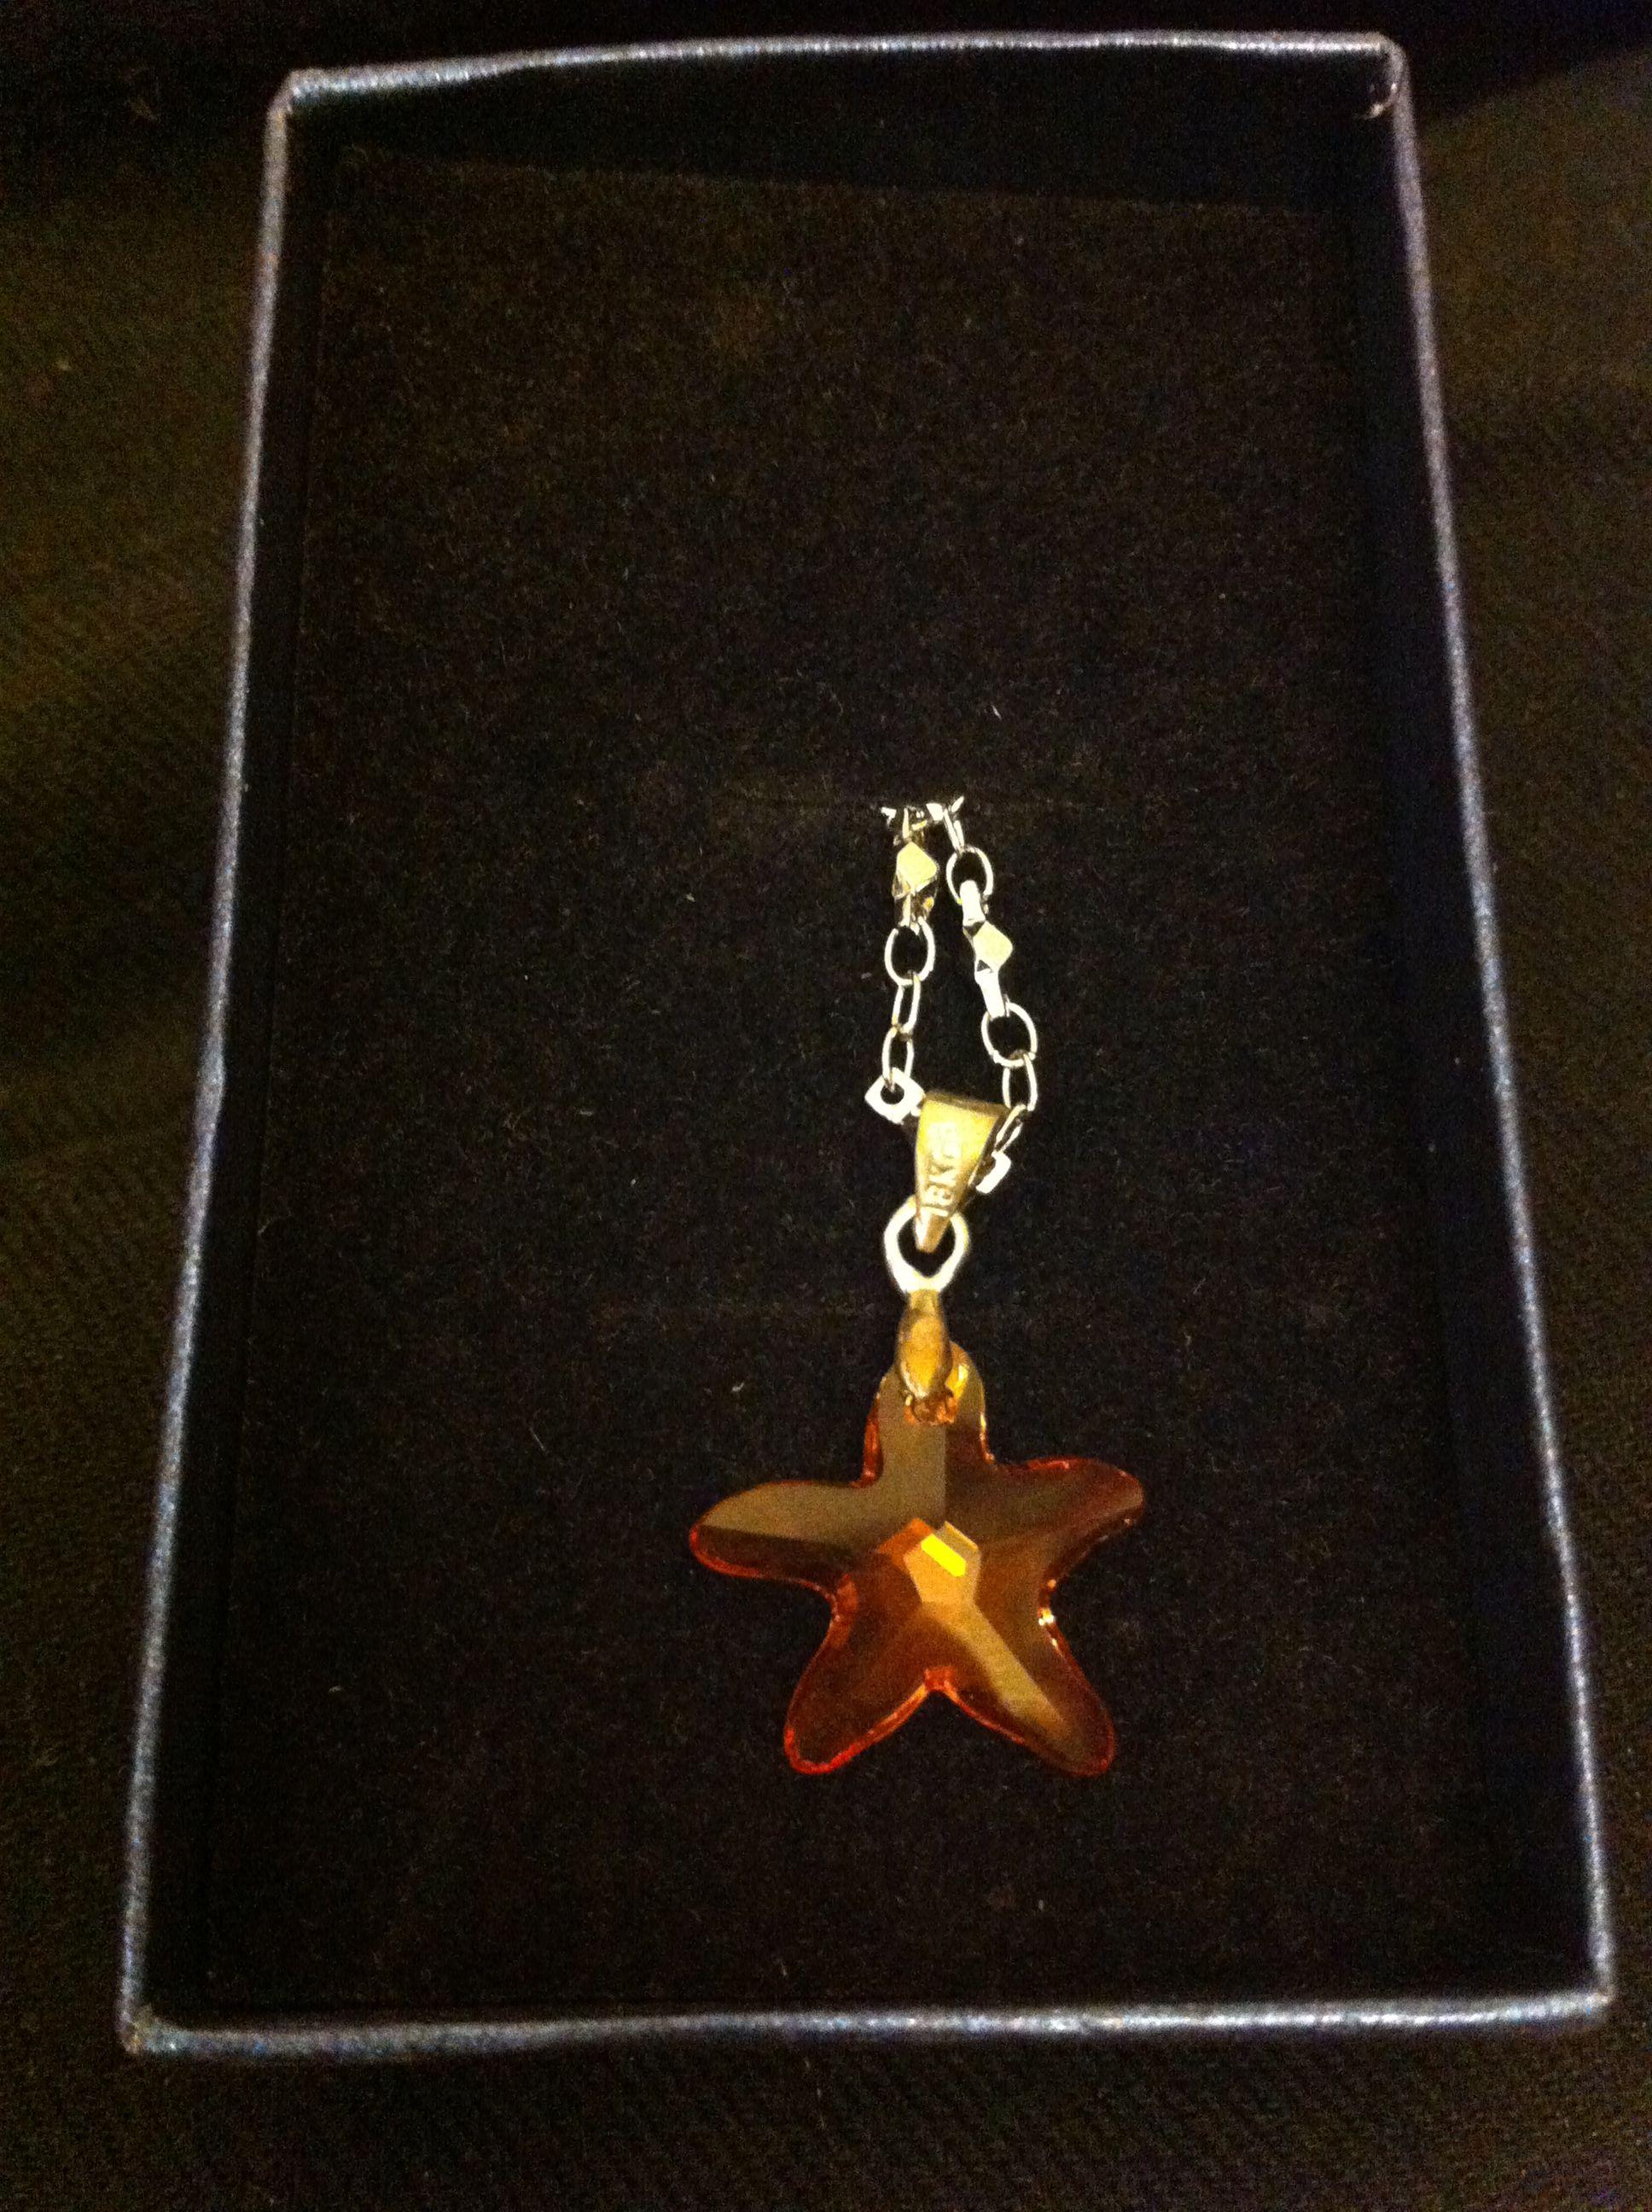 Swarovski Mandarine Crystal Necklace